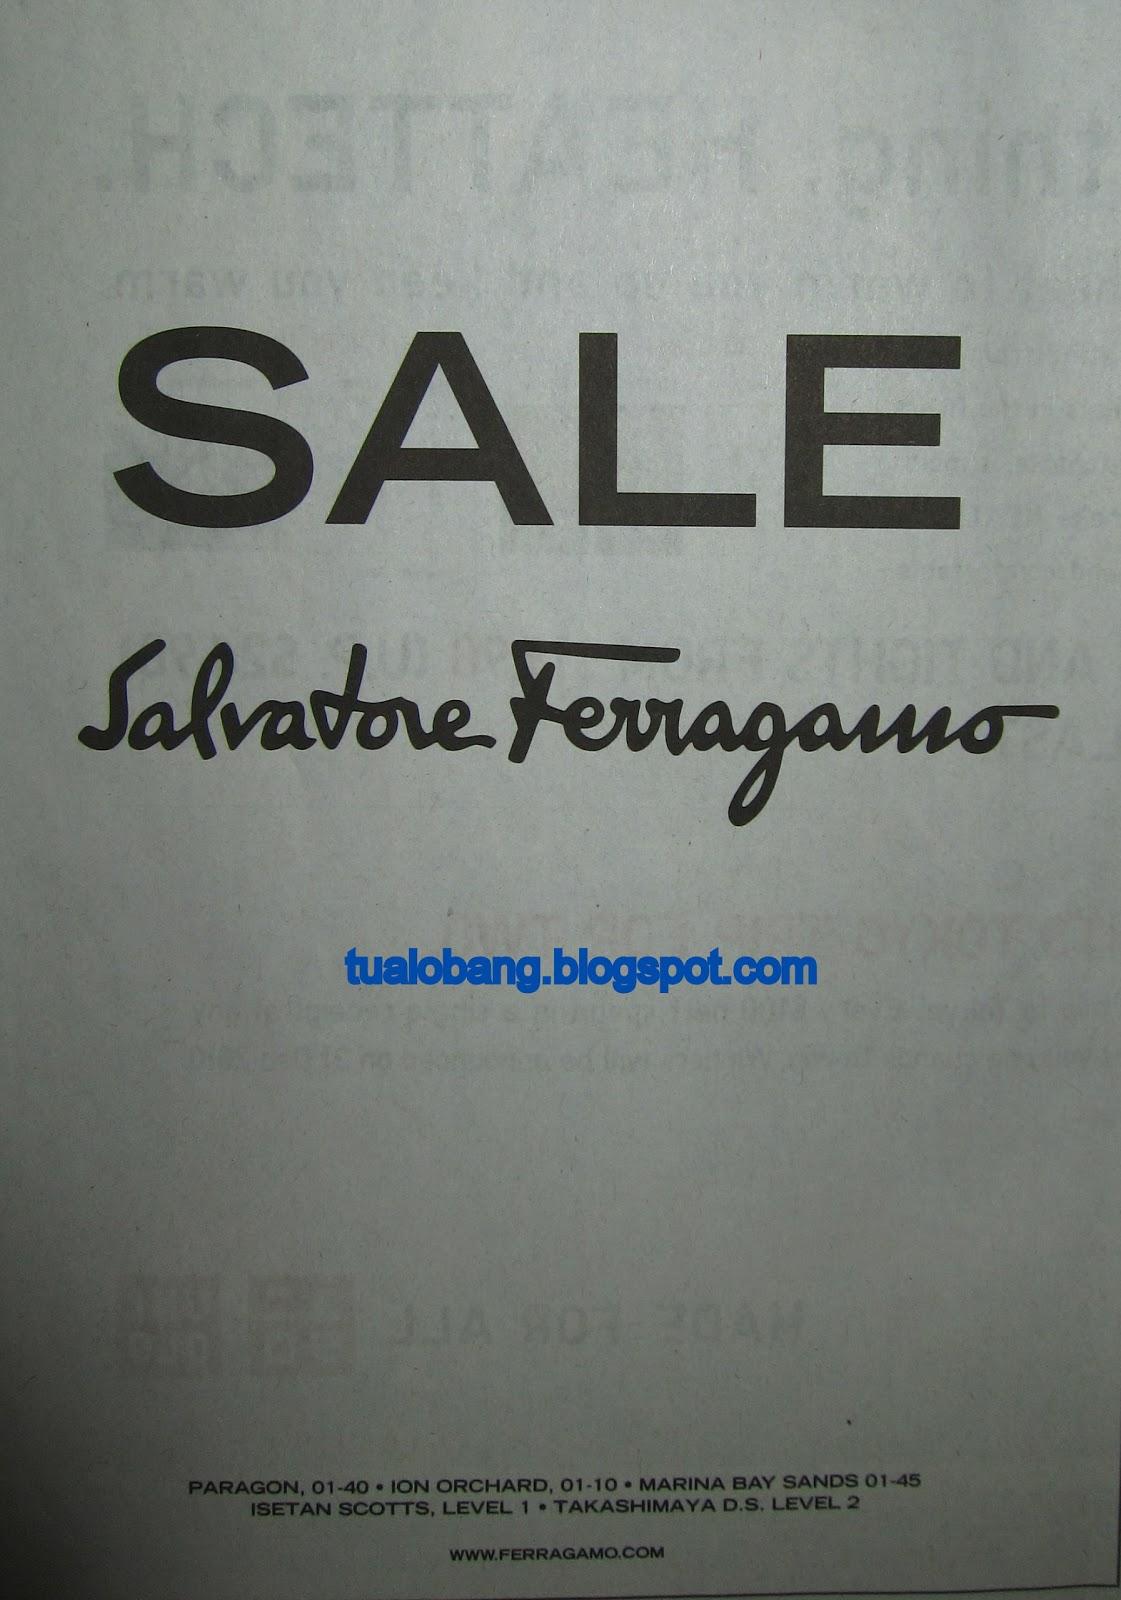 Tua Lobang: Salvatore Ferragamo Sale now on!